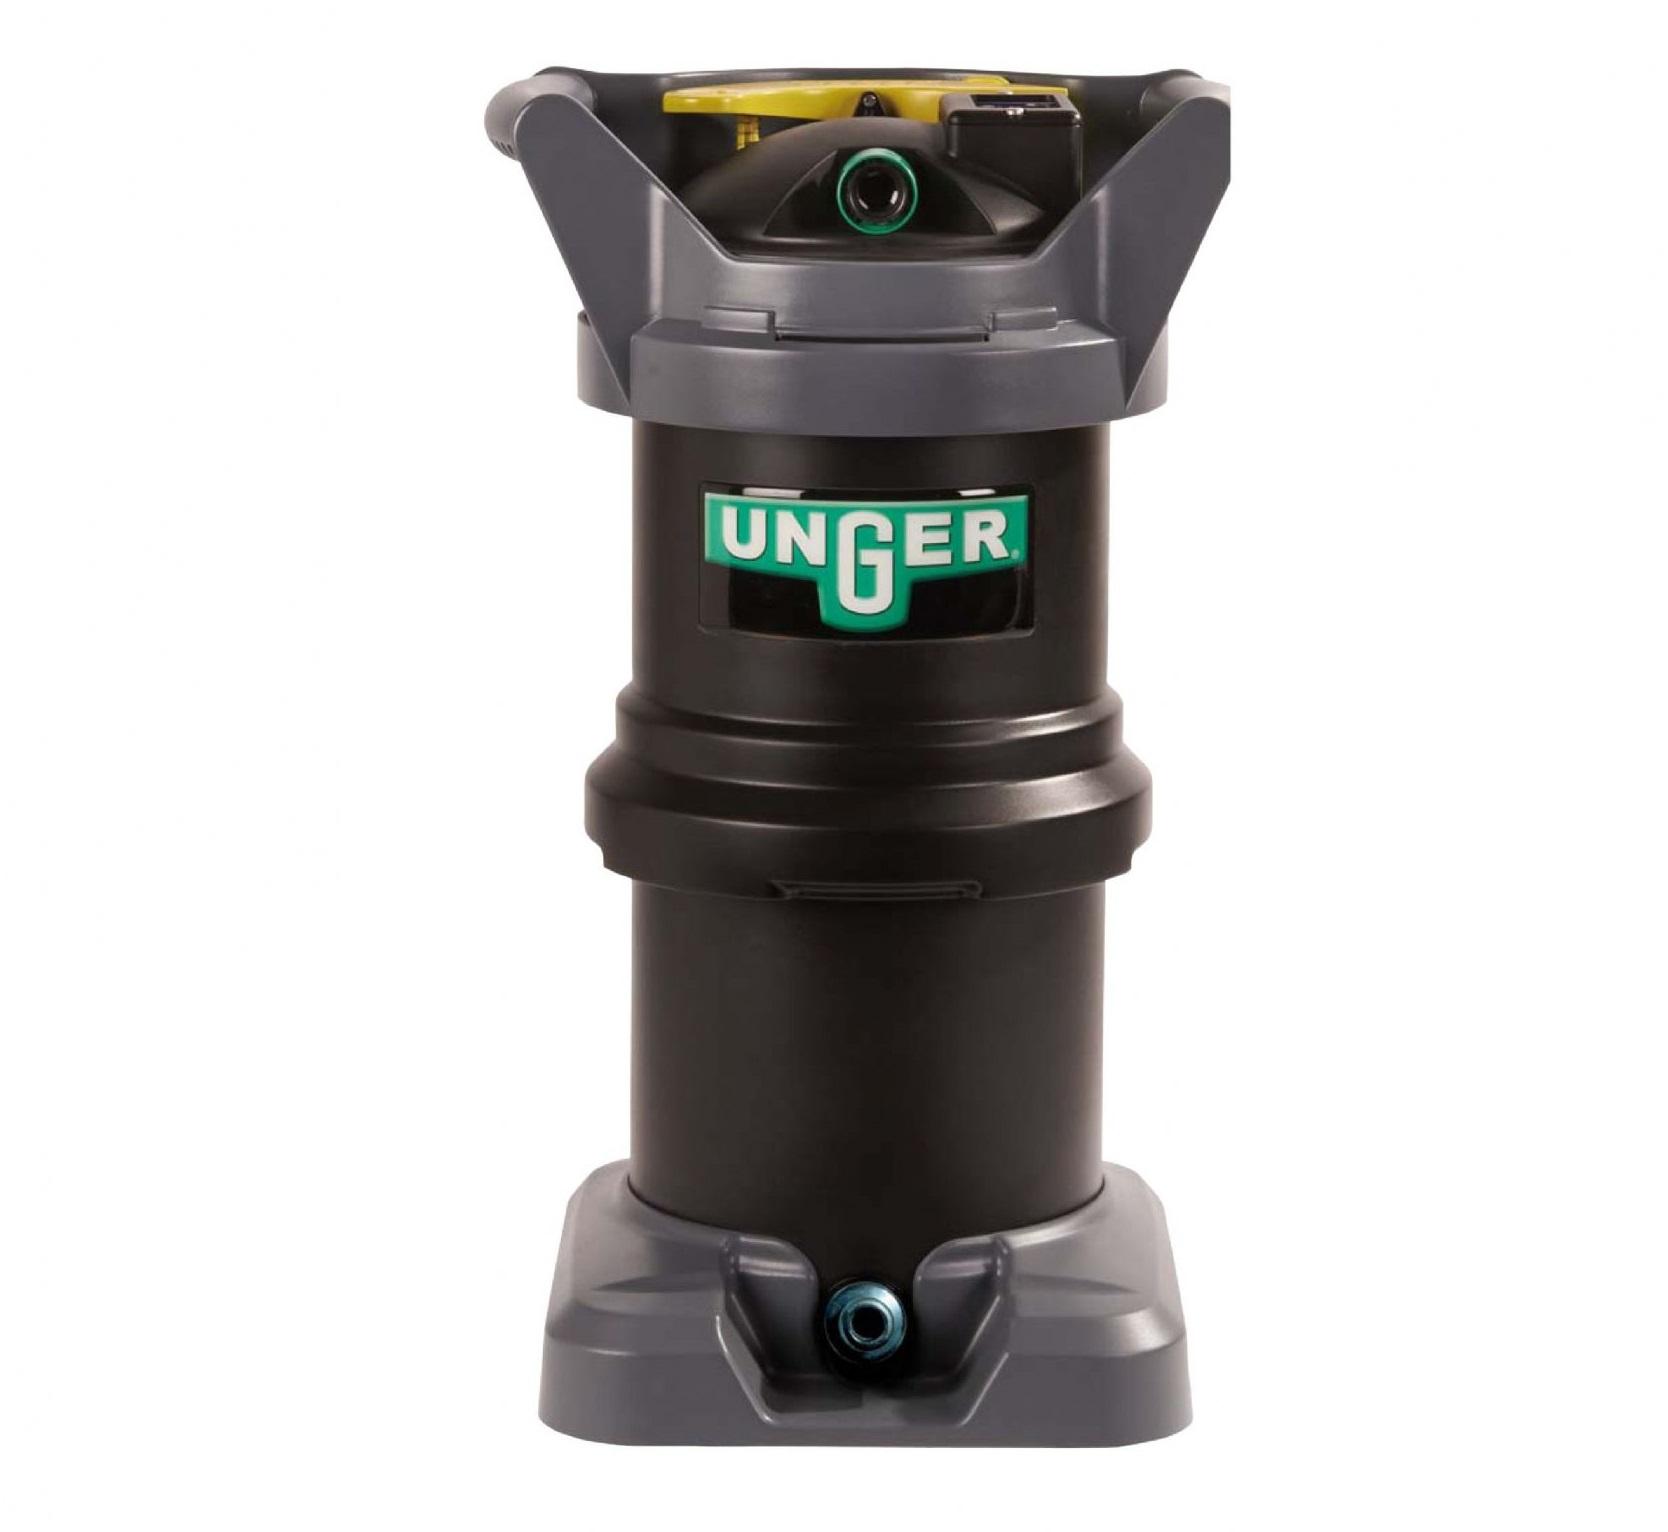 Unger-nLite-Hydropower-DI-Filter-12ltr